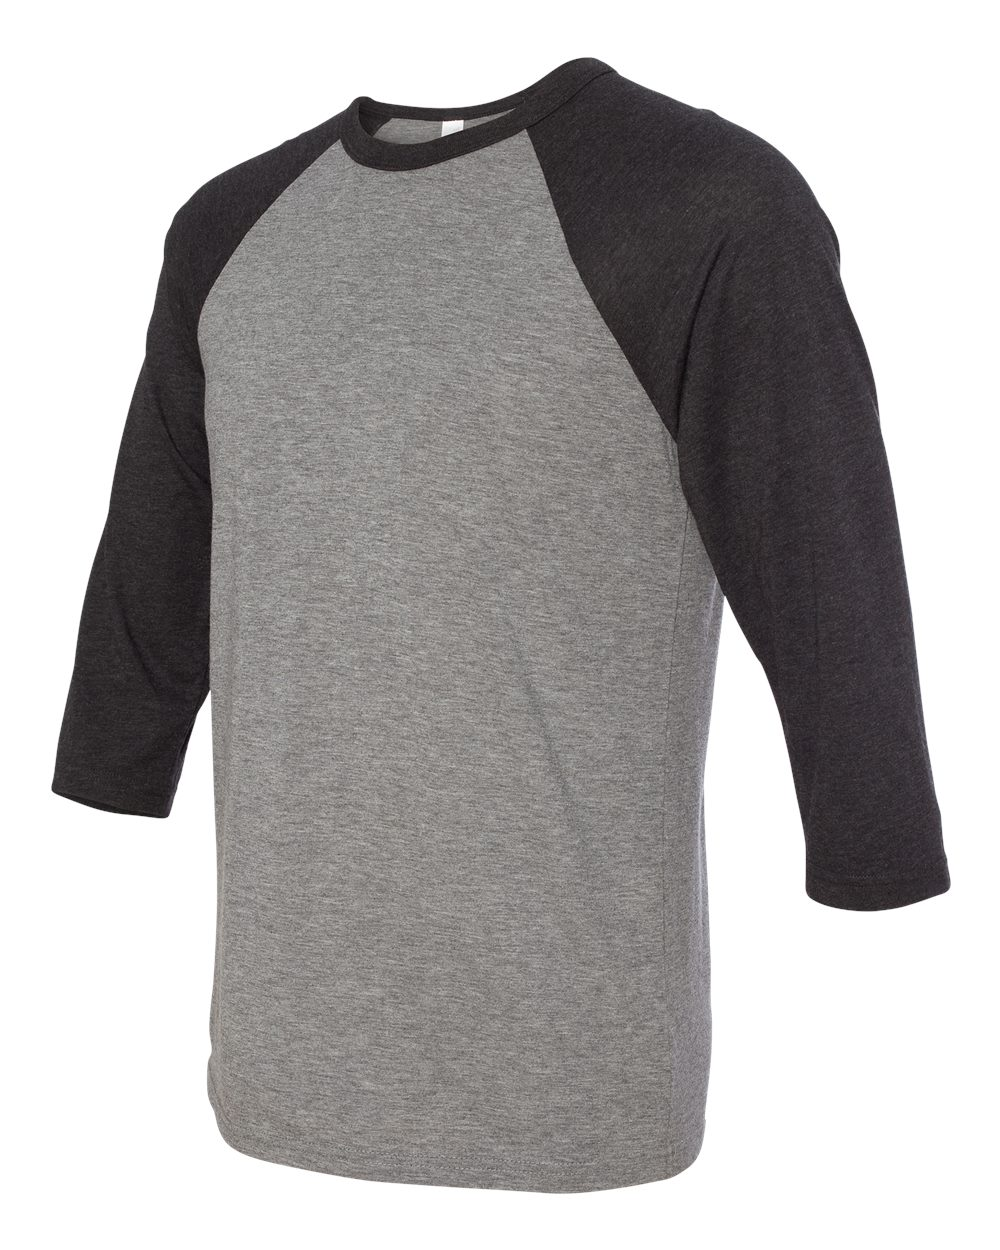 52ce17d4 Bella + Canvas 3200 - Unisex Three-Quarter Sleeve Baseball T-Shirt -  Friendly Arctic Printing